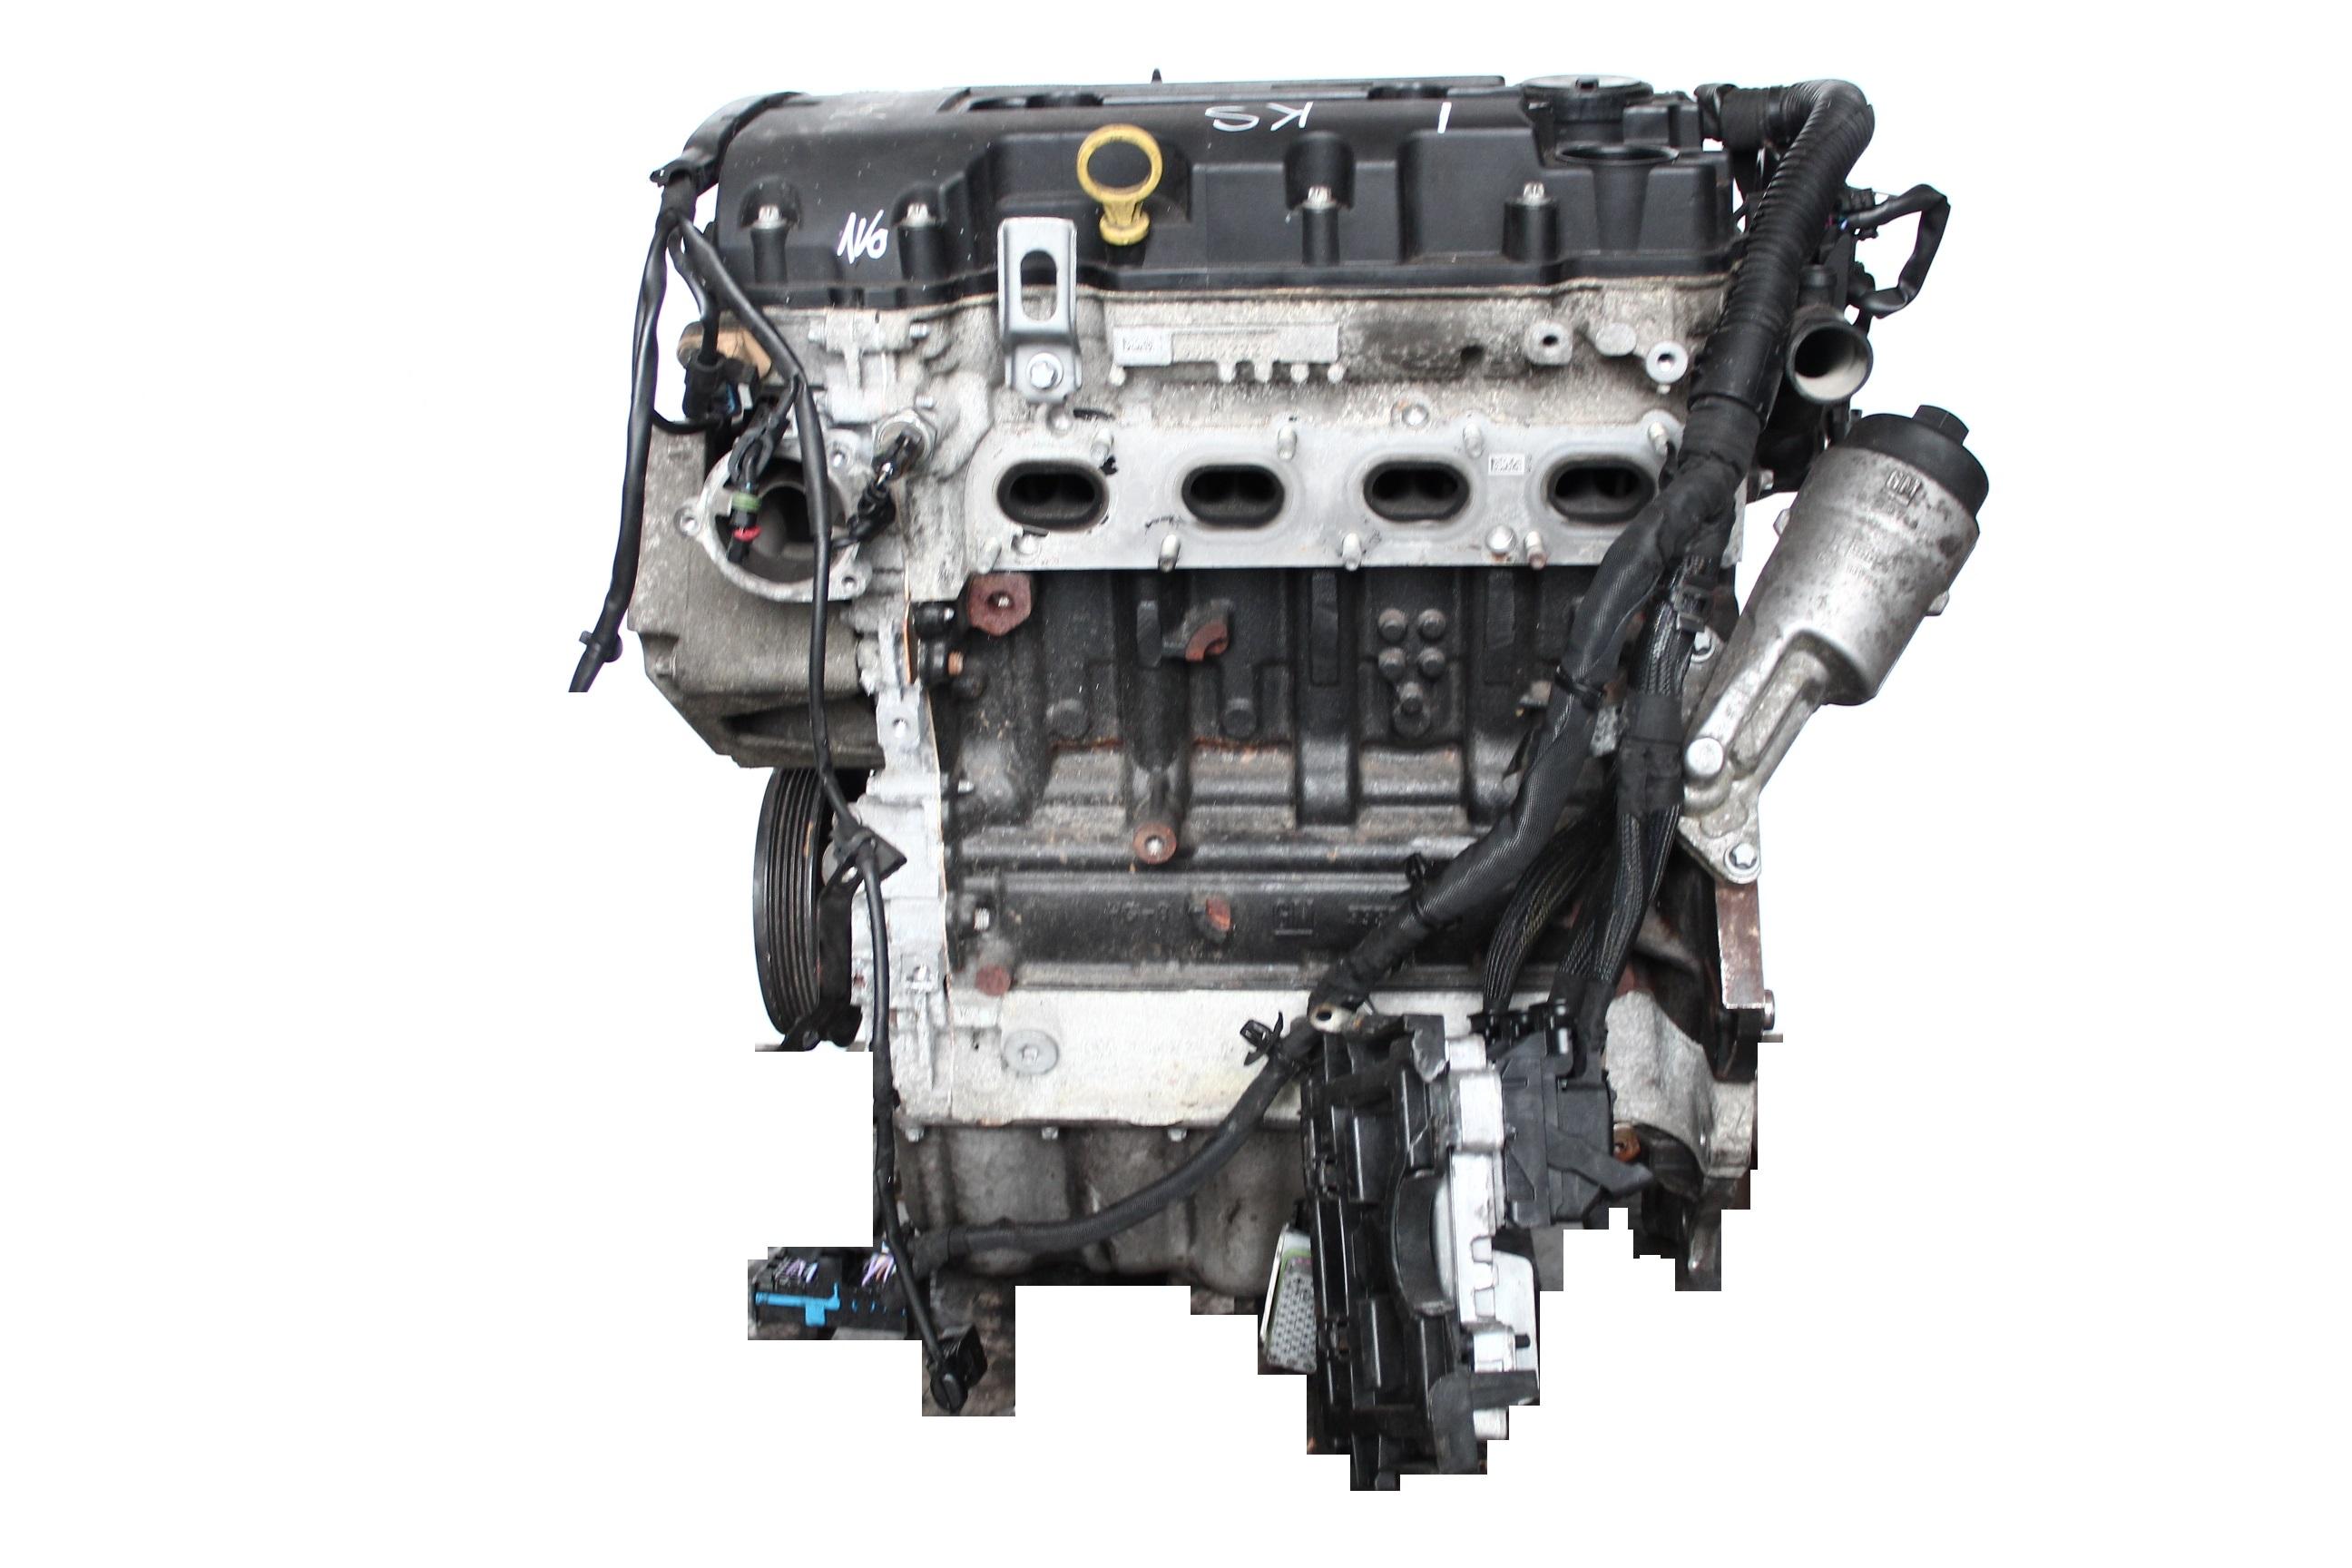 Motor 2015 Opel Astra J Meriva B Adam 1,4 B14XER B14 mit Anbauteilen